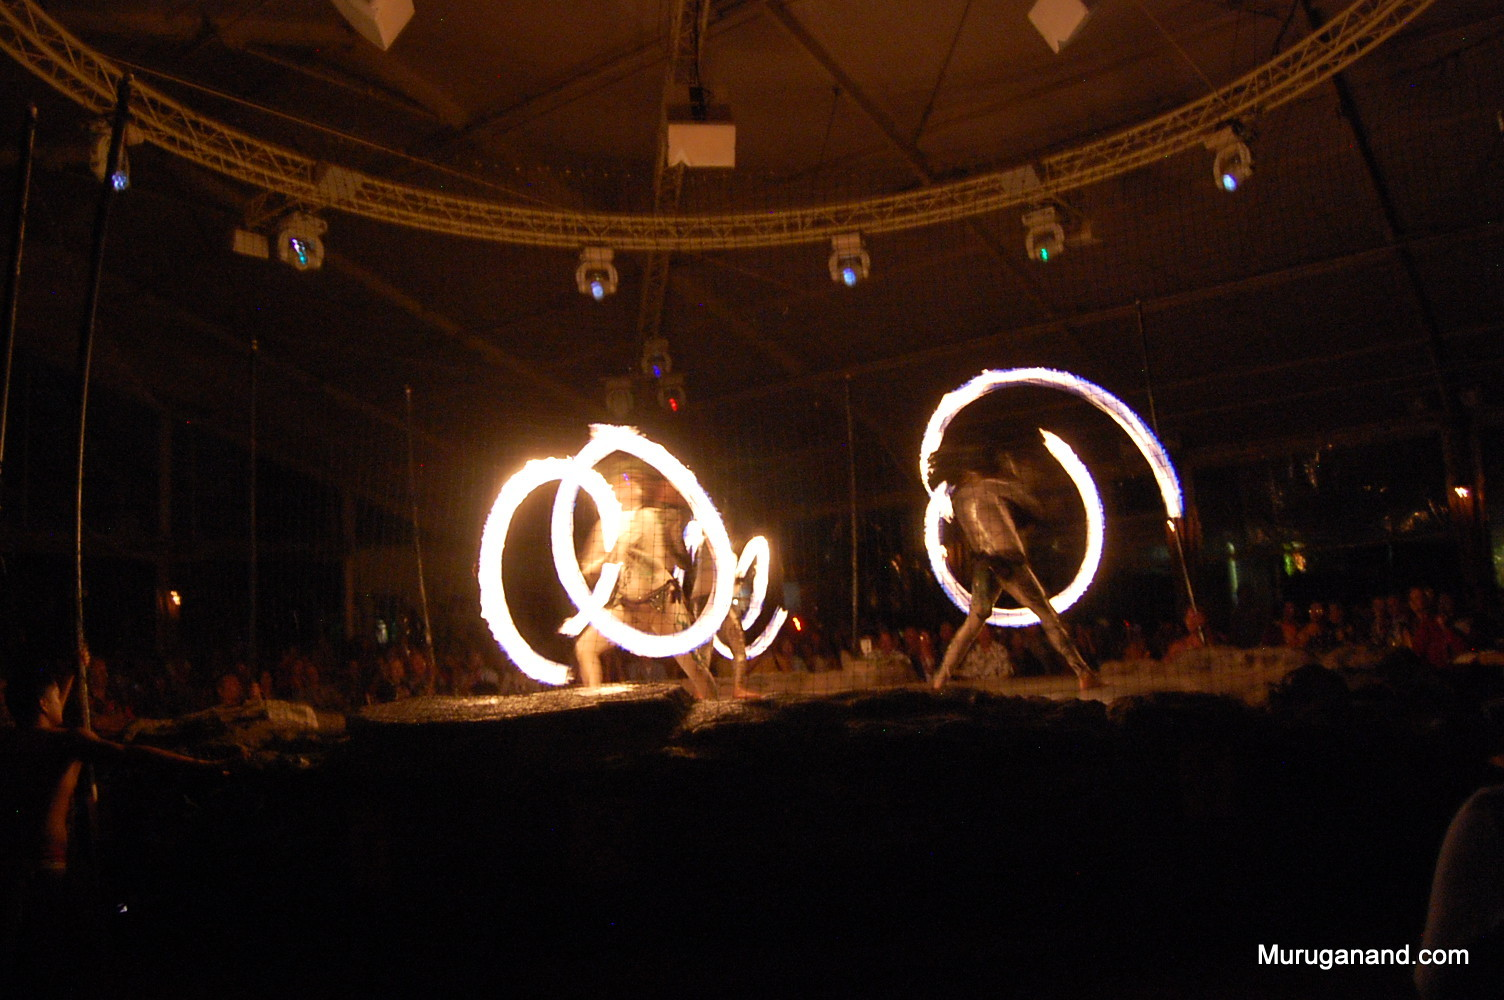 Fire Dancing at Luau (Kauai)